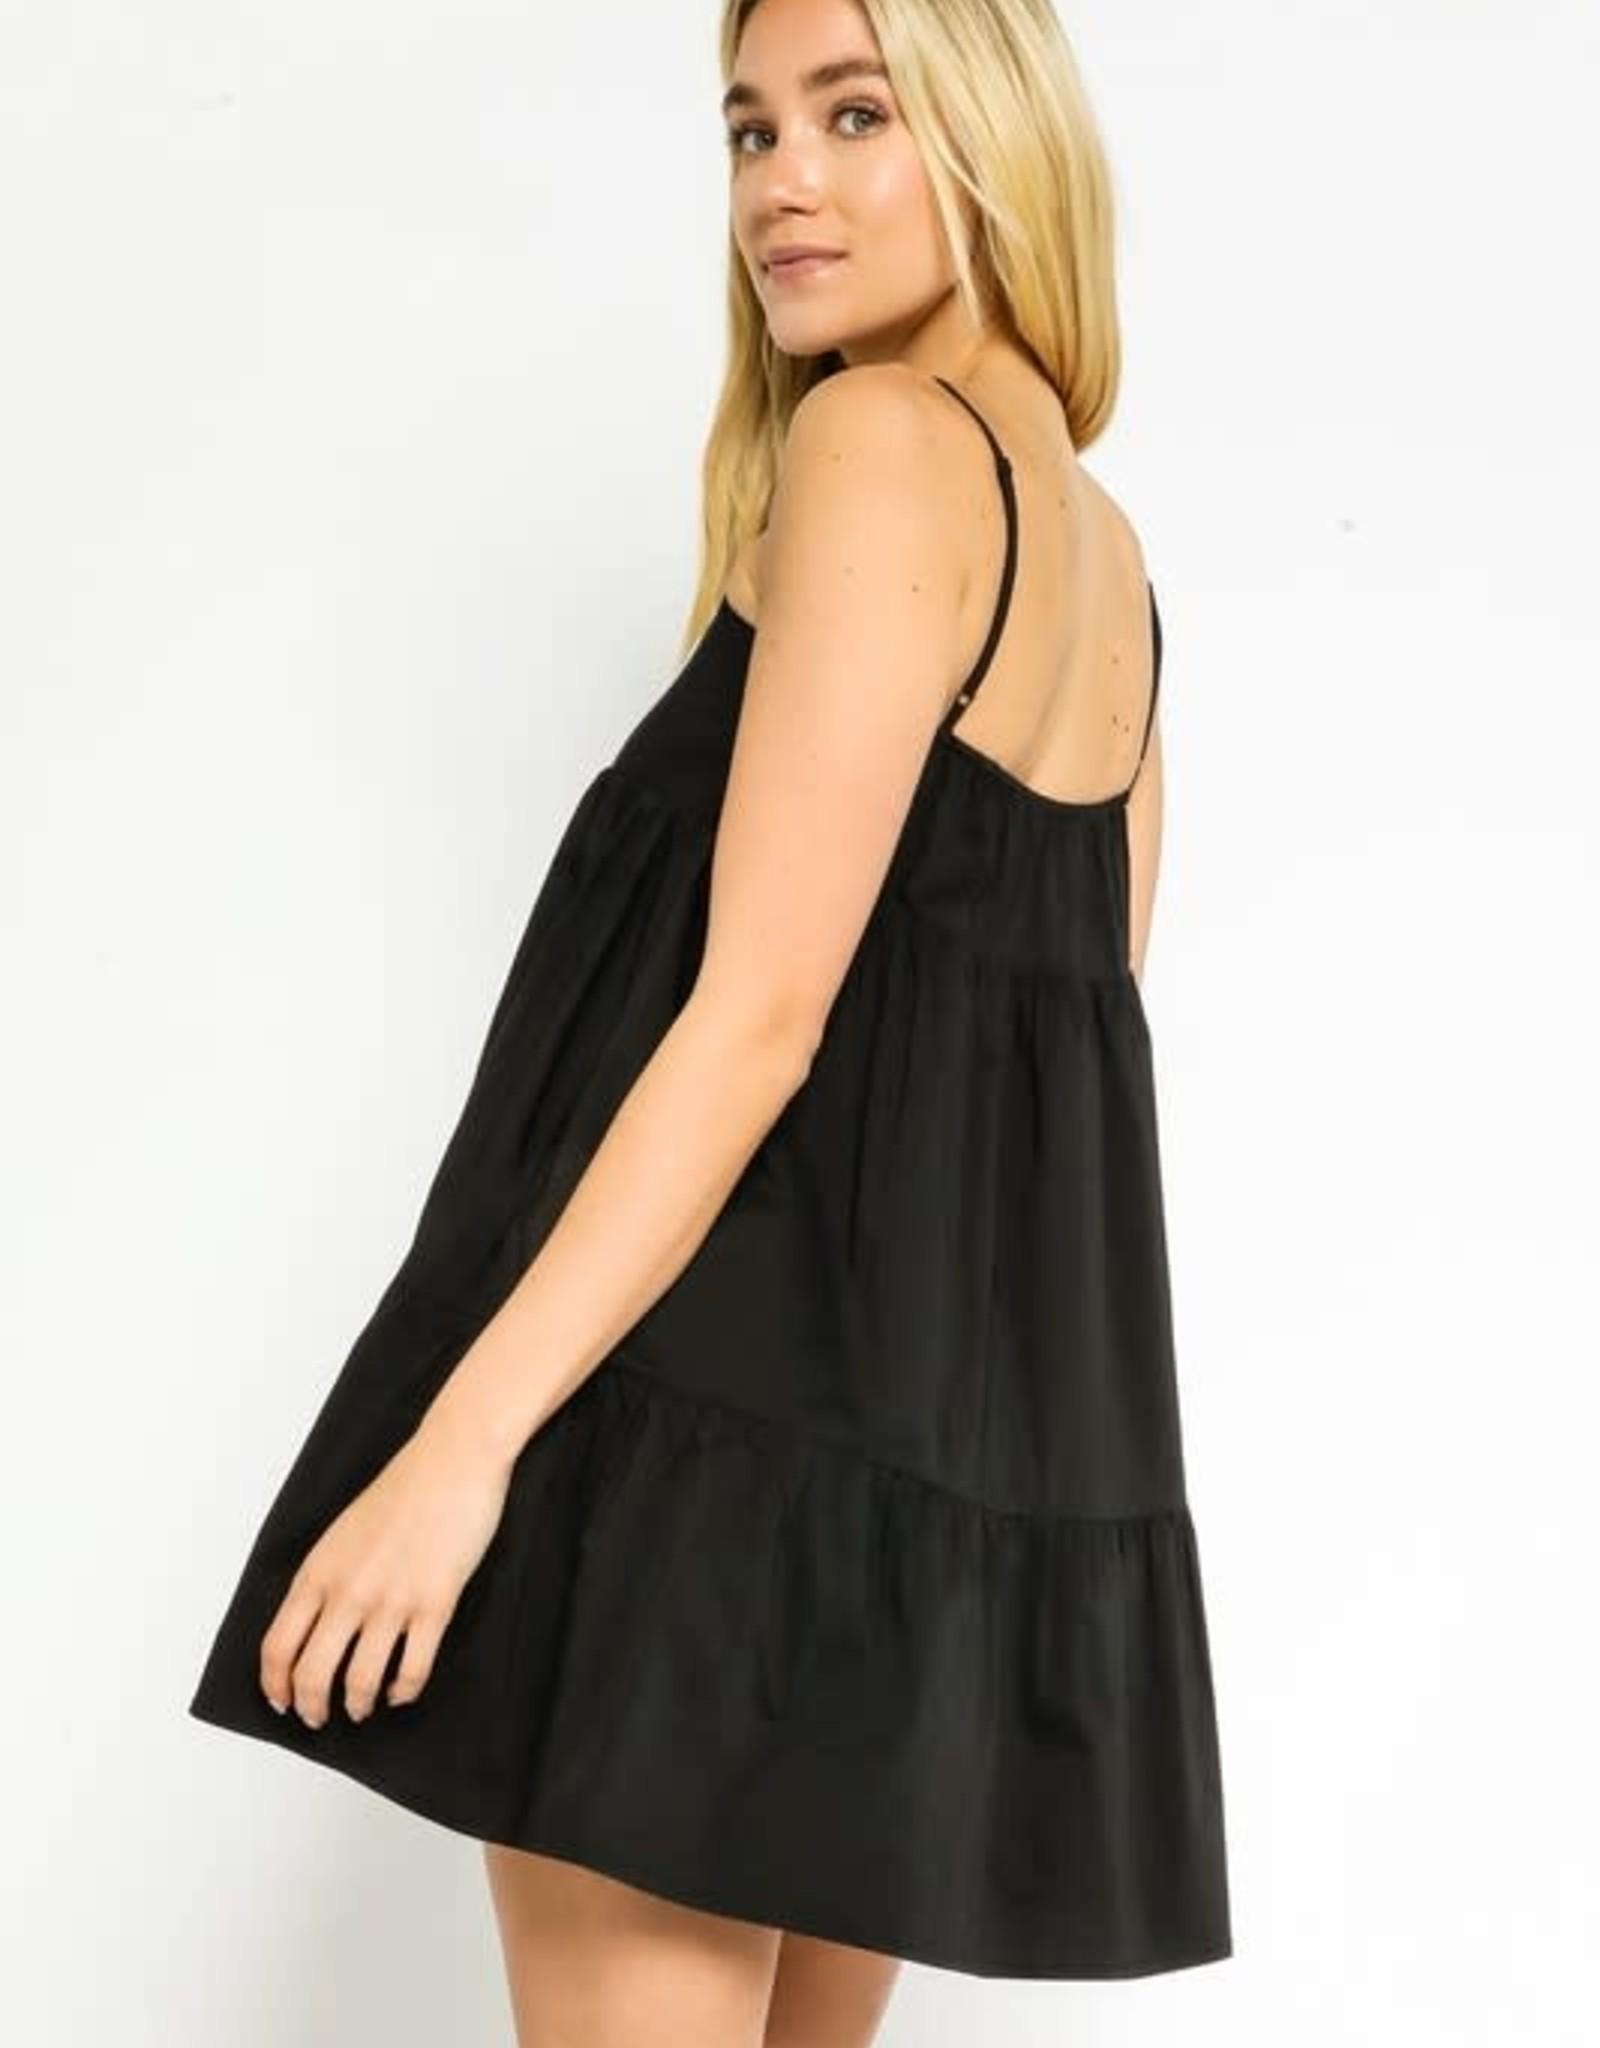 The Hahlie Dress